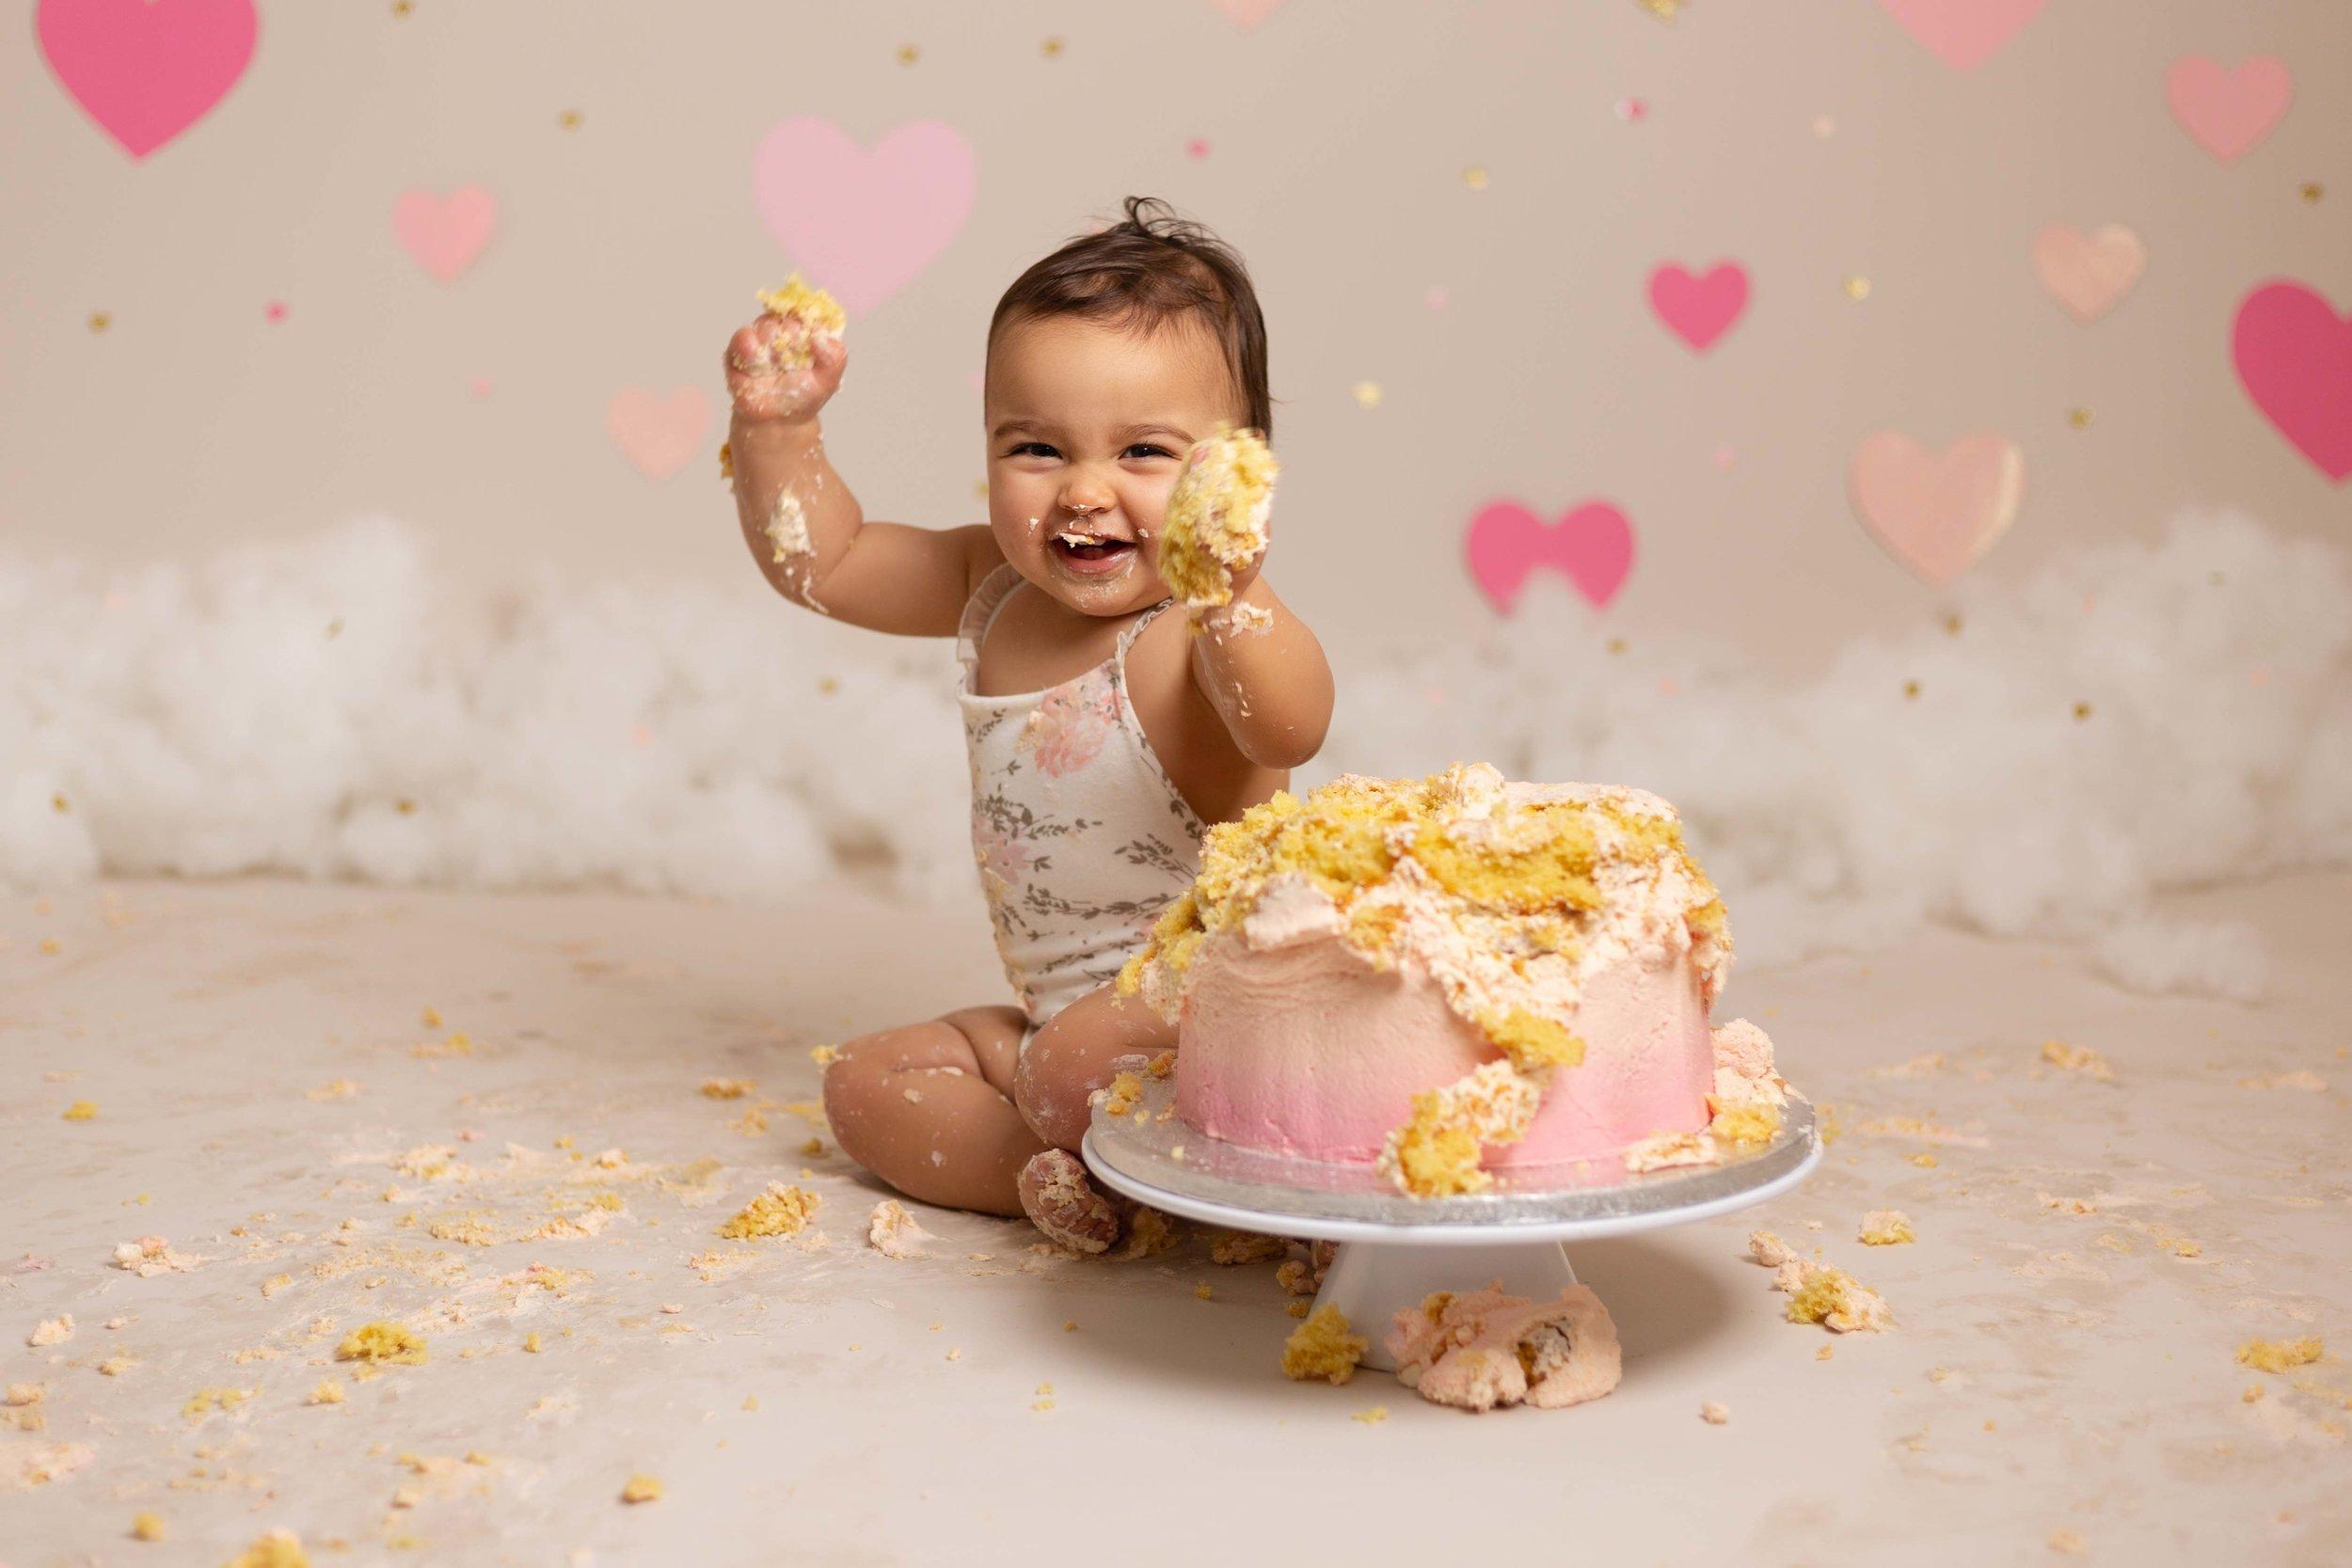 Lea-cooper-photography-cake-smash-photographer-1st-birthday-photos-willenhall-wolverhampton-west-midlands-birmingham-valentines-day-13.jpg